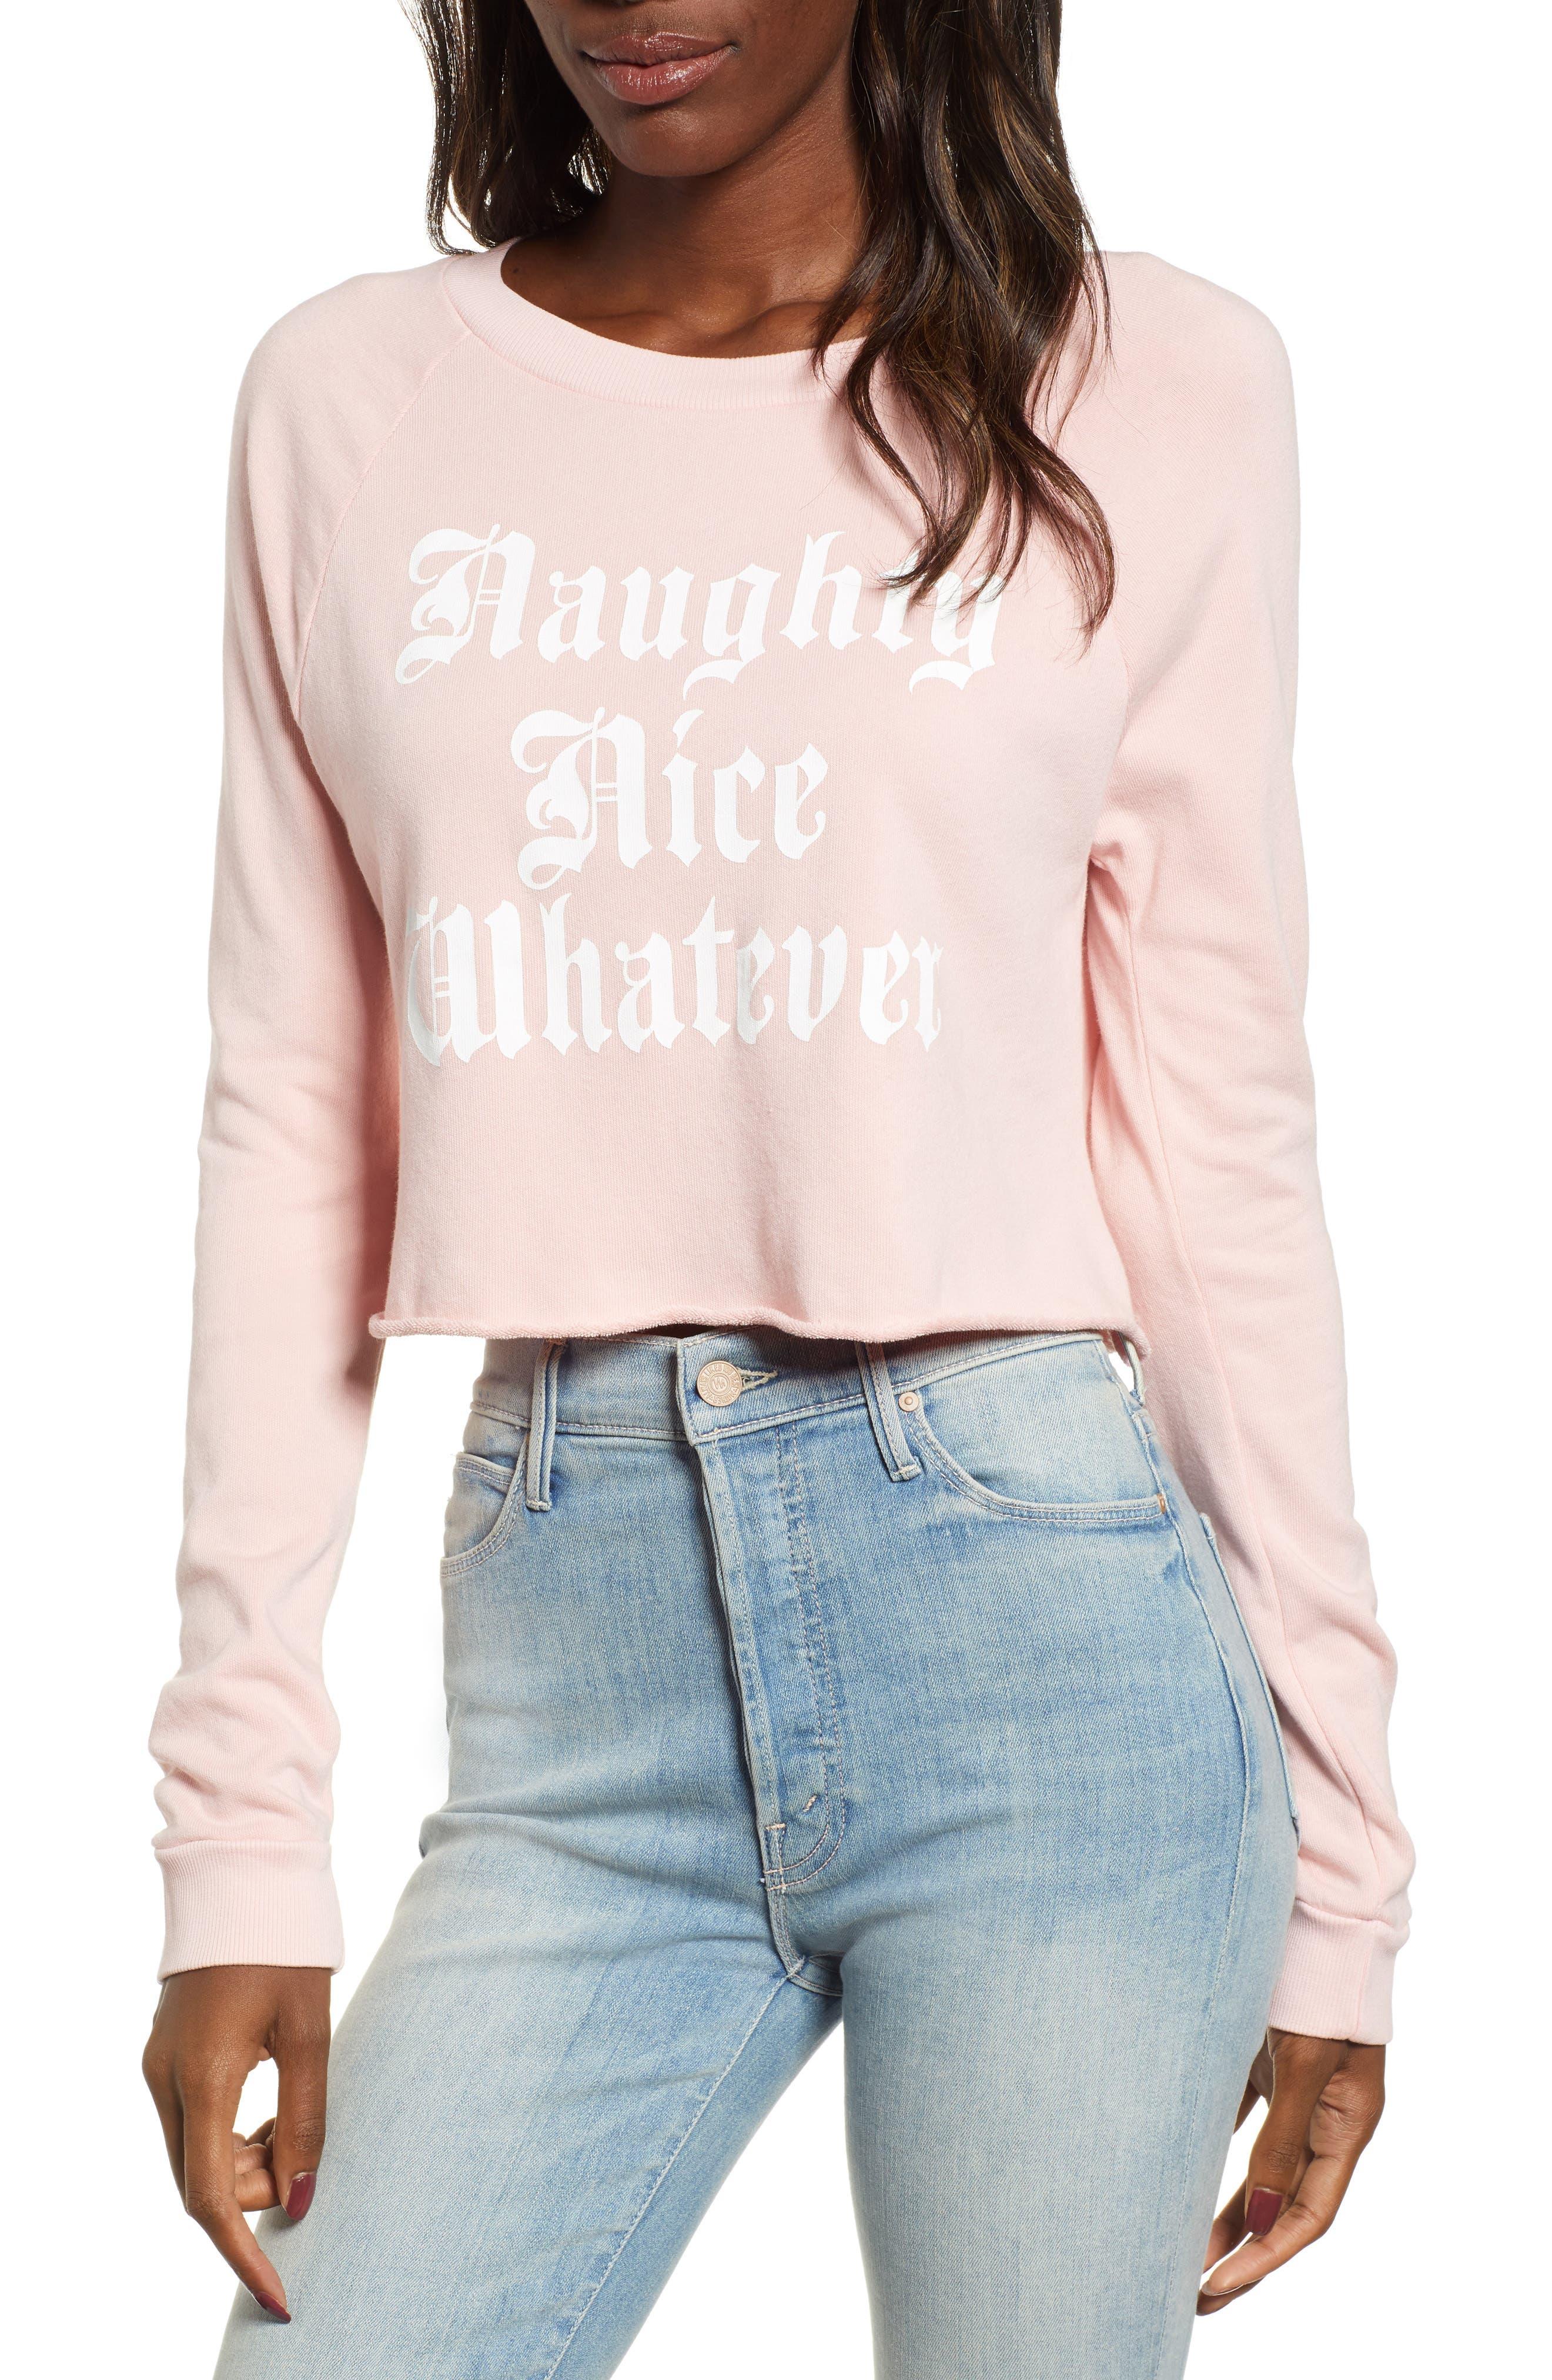 Naughty Nice Whatever Sweatshirt,                         Main,                         color, ROMANTIC